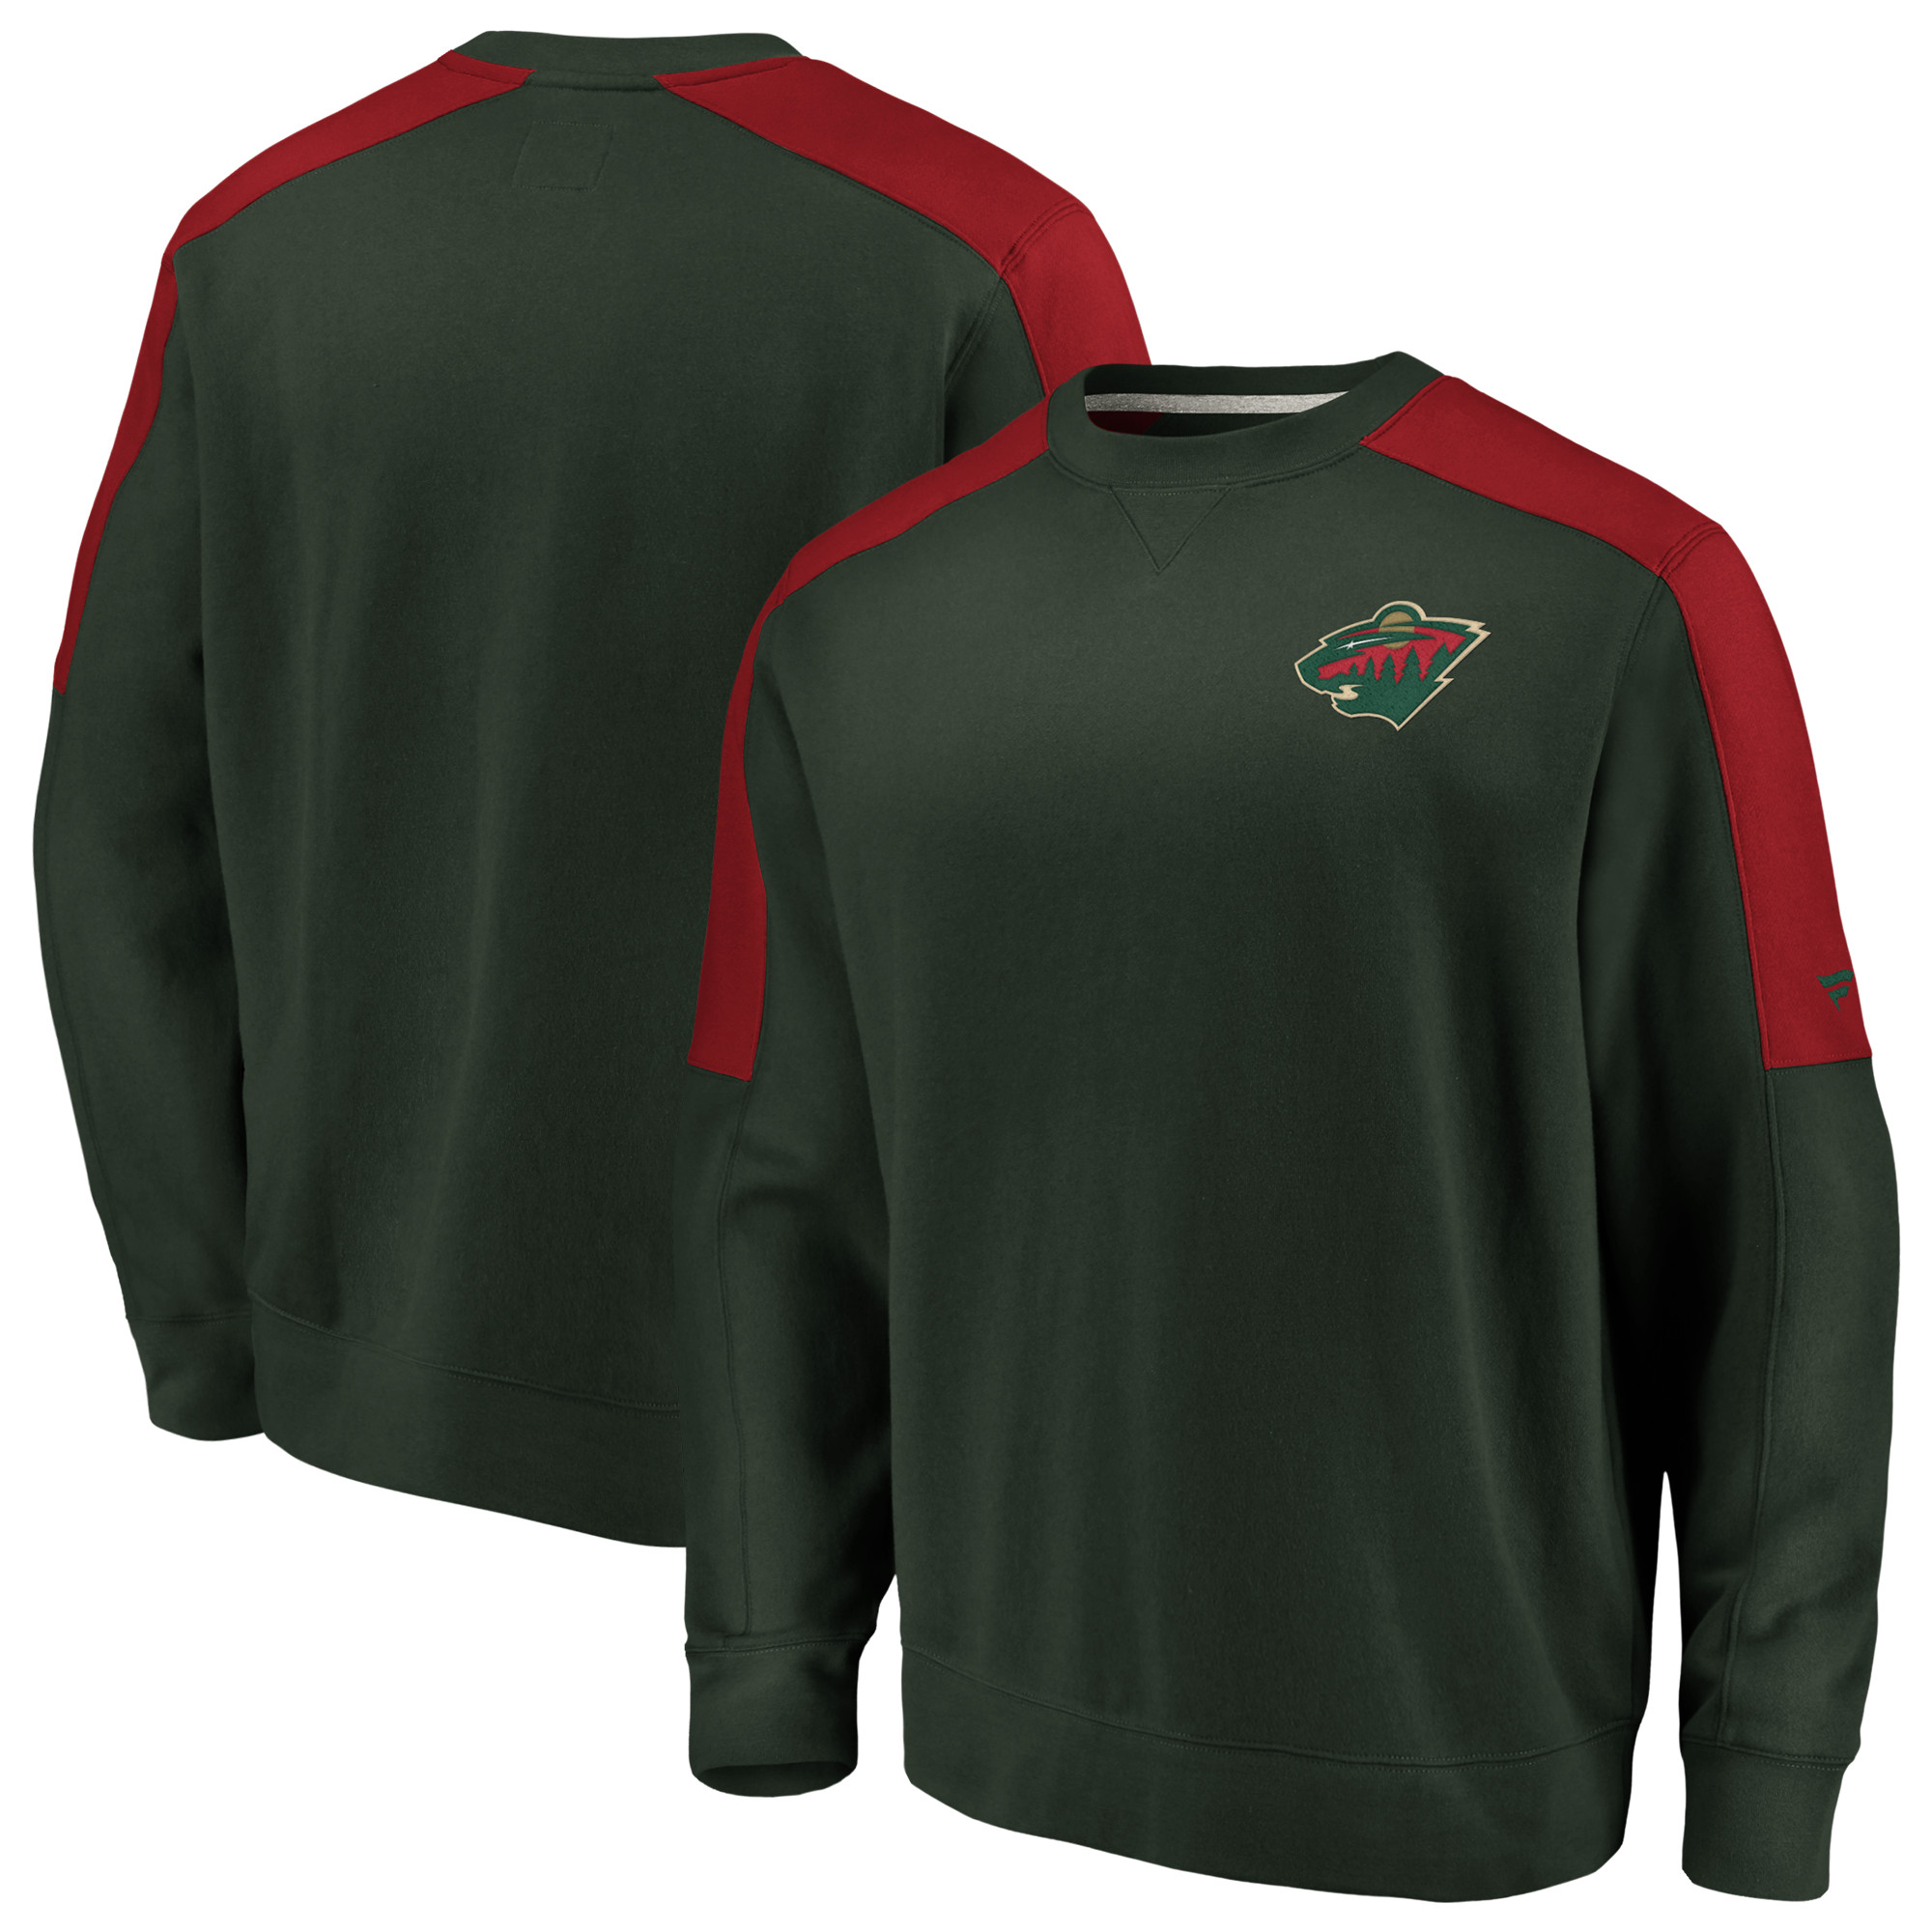 Minnesota Wild Fanatics Branded Iconic Crew Fleece Sweatshirt - Green/Red